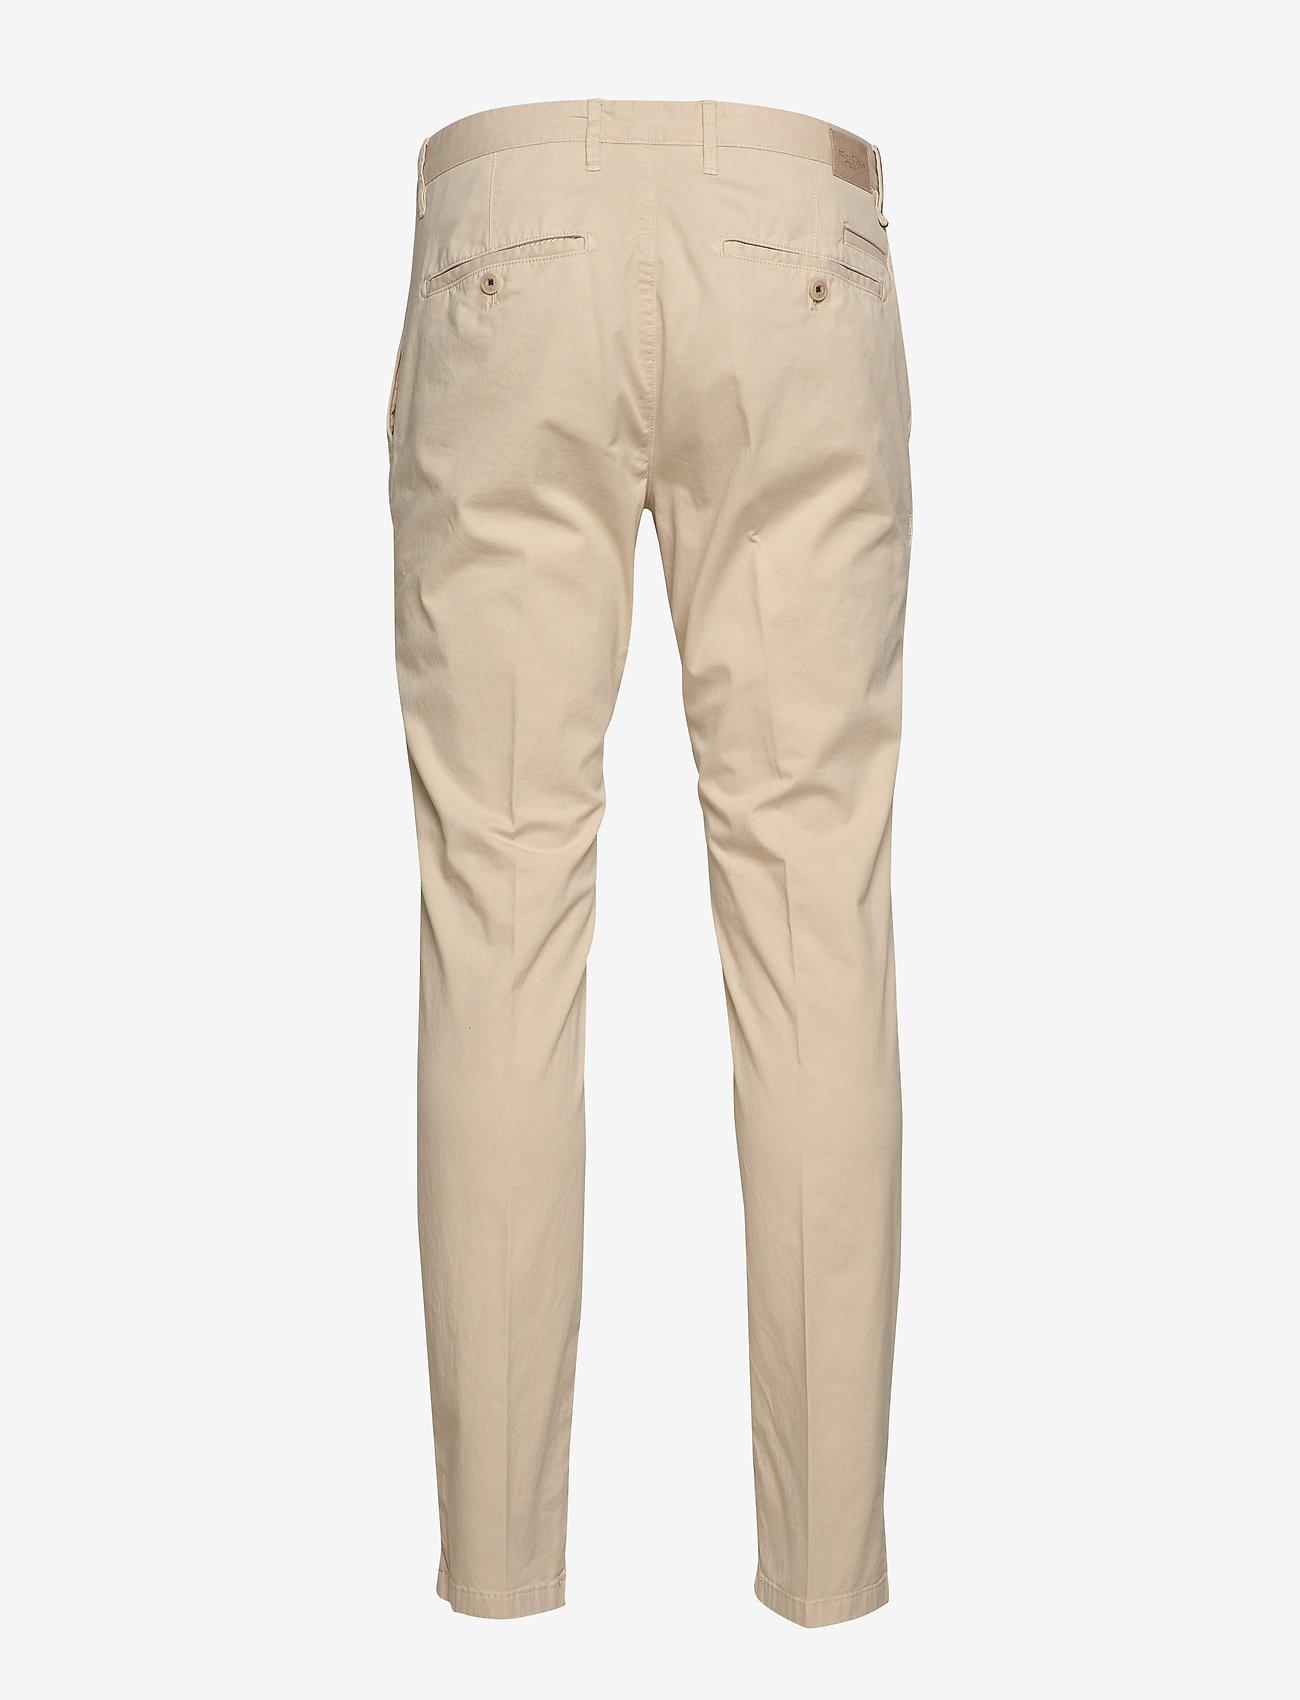 Marc O'Polo - Pants - pantalons chino - moonbeam - 1